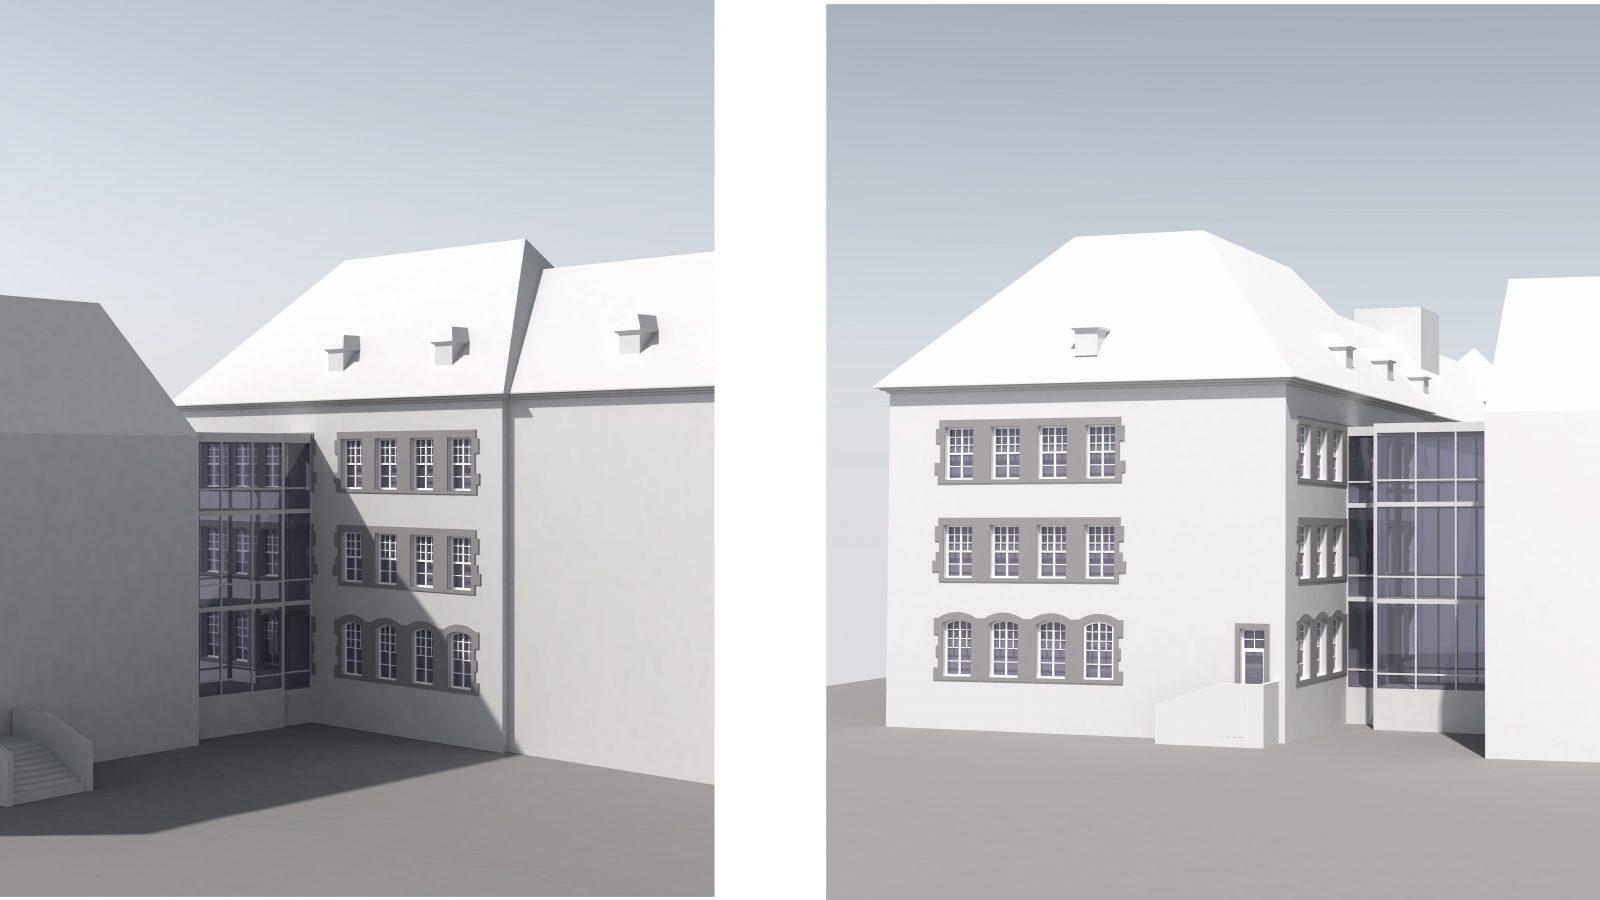 Maler-Becker-Schule in Mainz